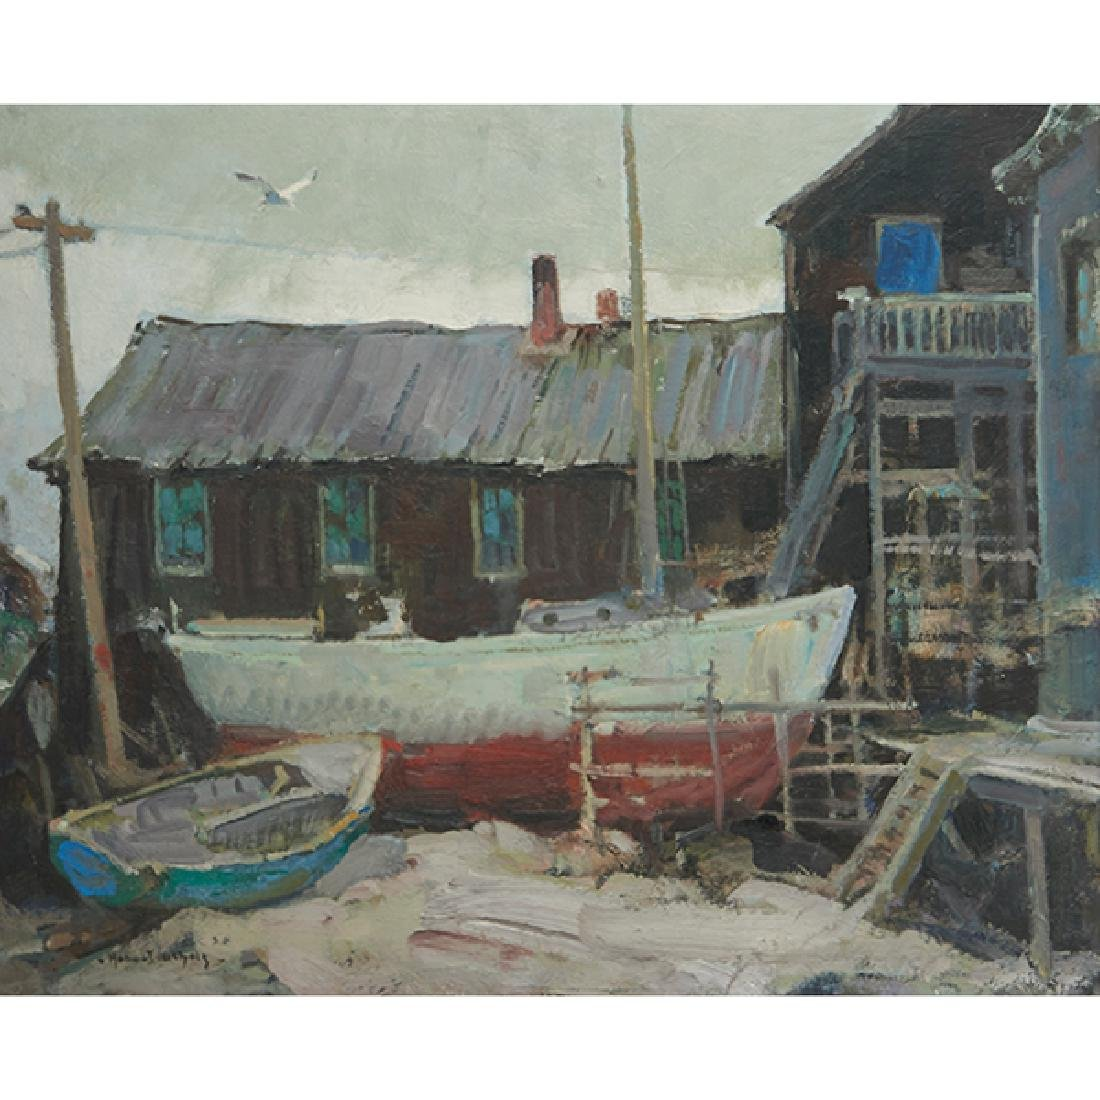 Hobart Nichols Jr., (American, 1869-1962), Boatyard,